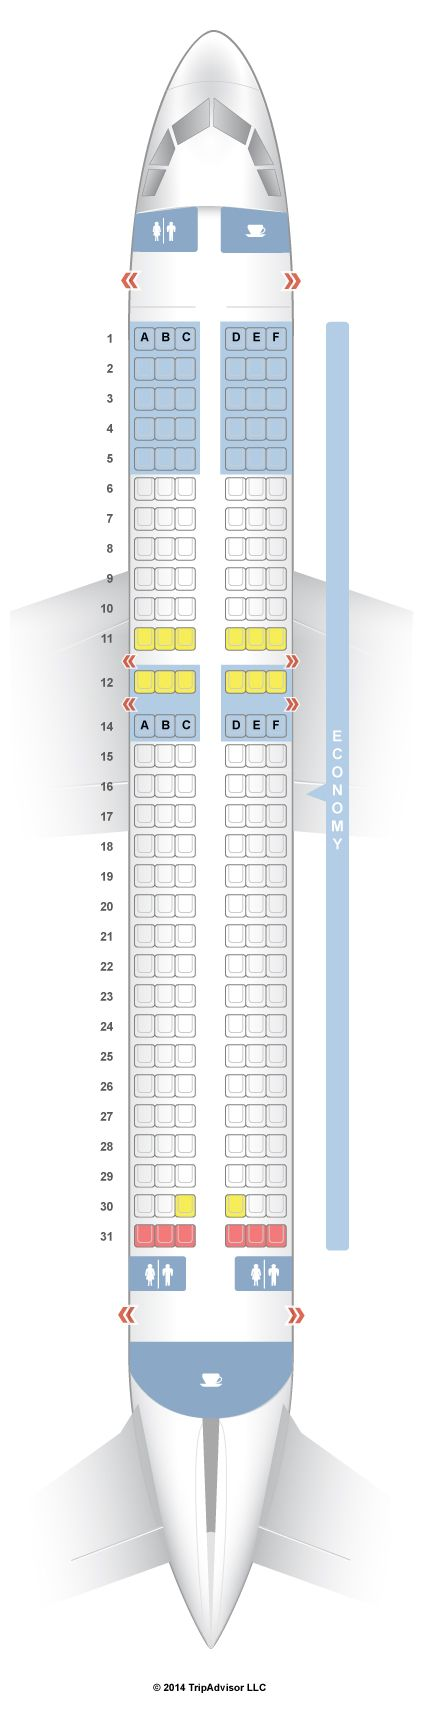 SeatGuru Seat Map AirAsia Airbus A320 (320) - SeatGuru